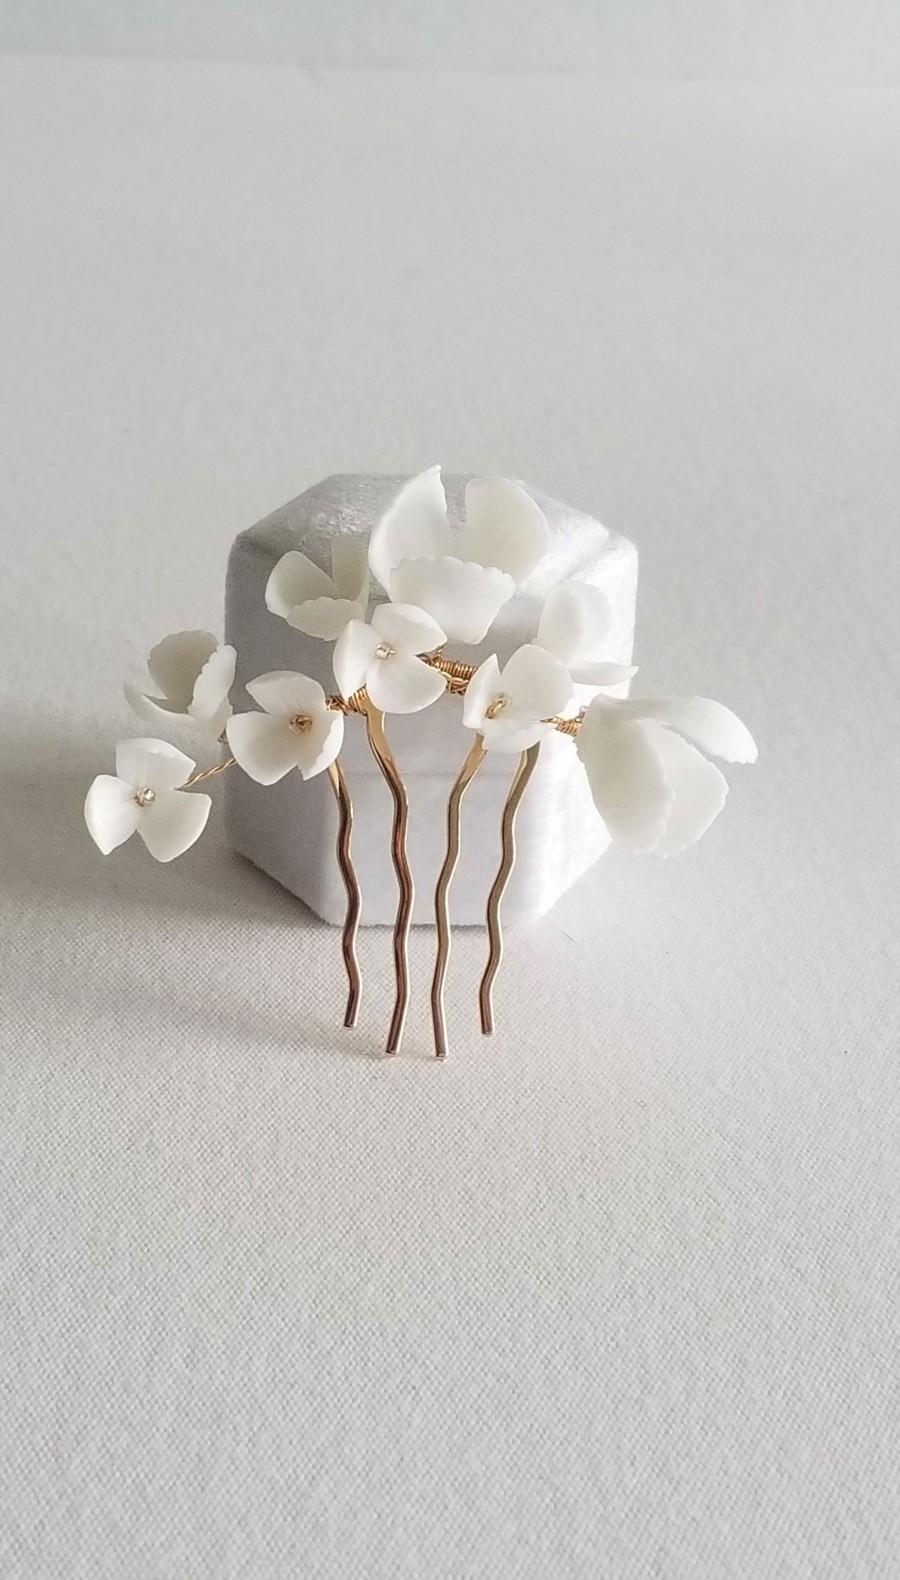 Wedding - Gold Wedding Hair Comb Porcelain Flowers, Small Gold Floral Wedding Hair Comb, Clay Flower Bridal Hair Comb